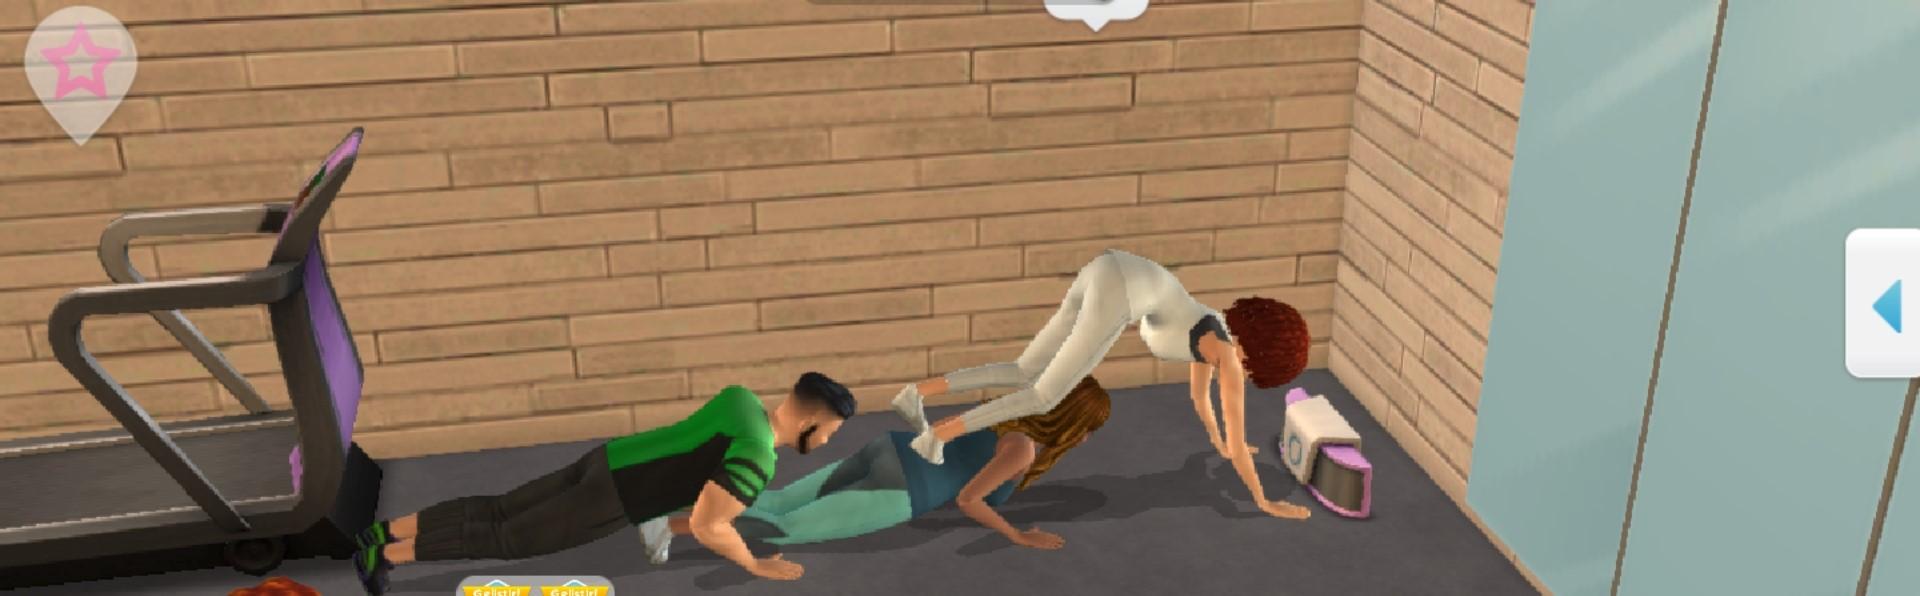 Screenshot_20180915-170328_The Sims.jpg